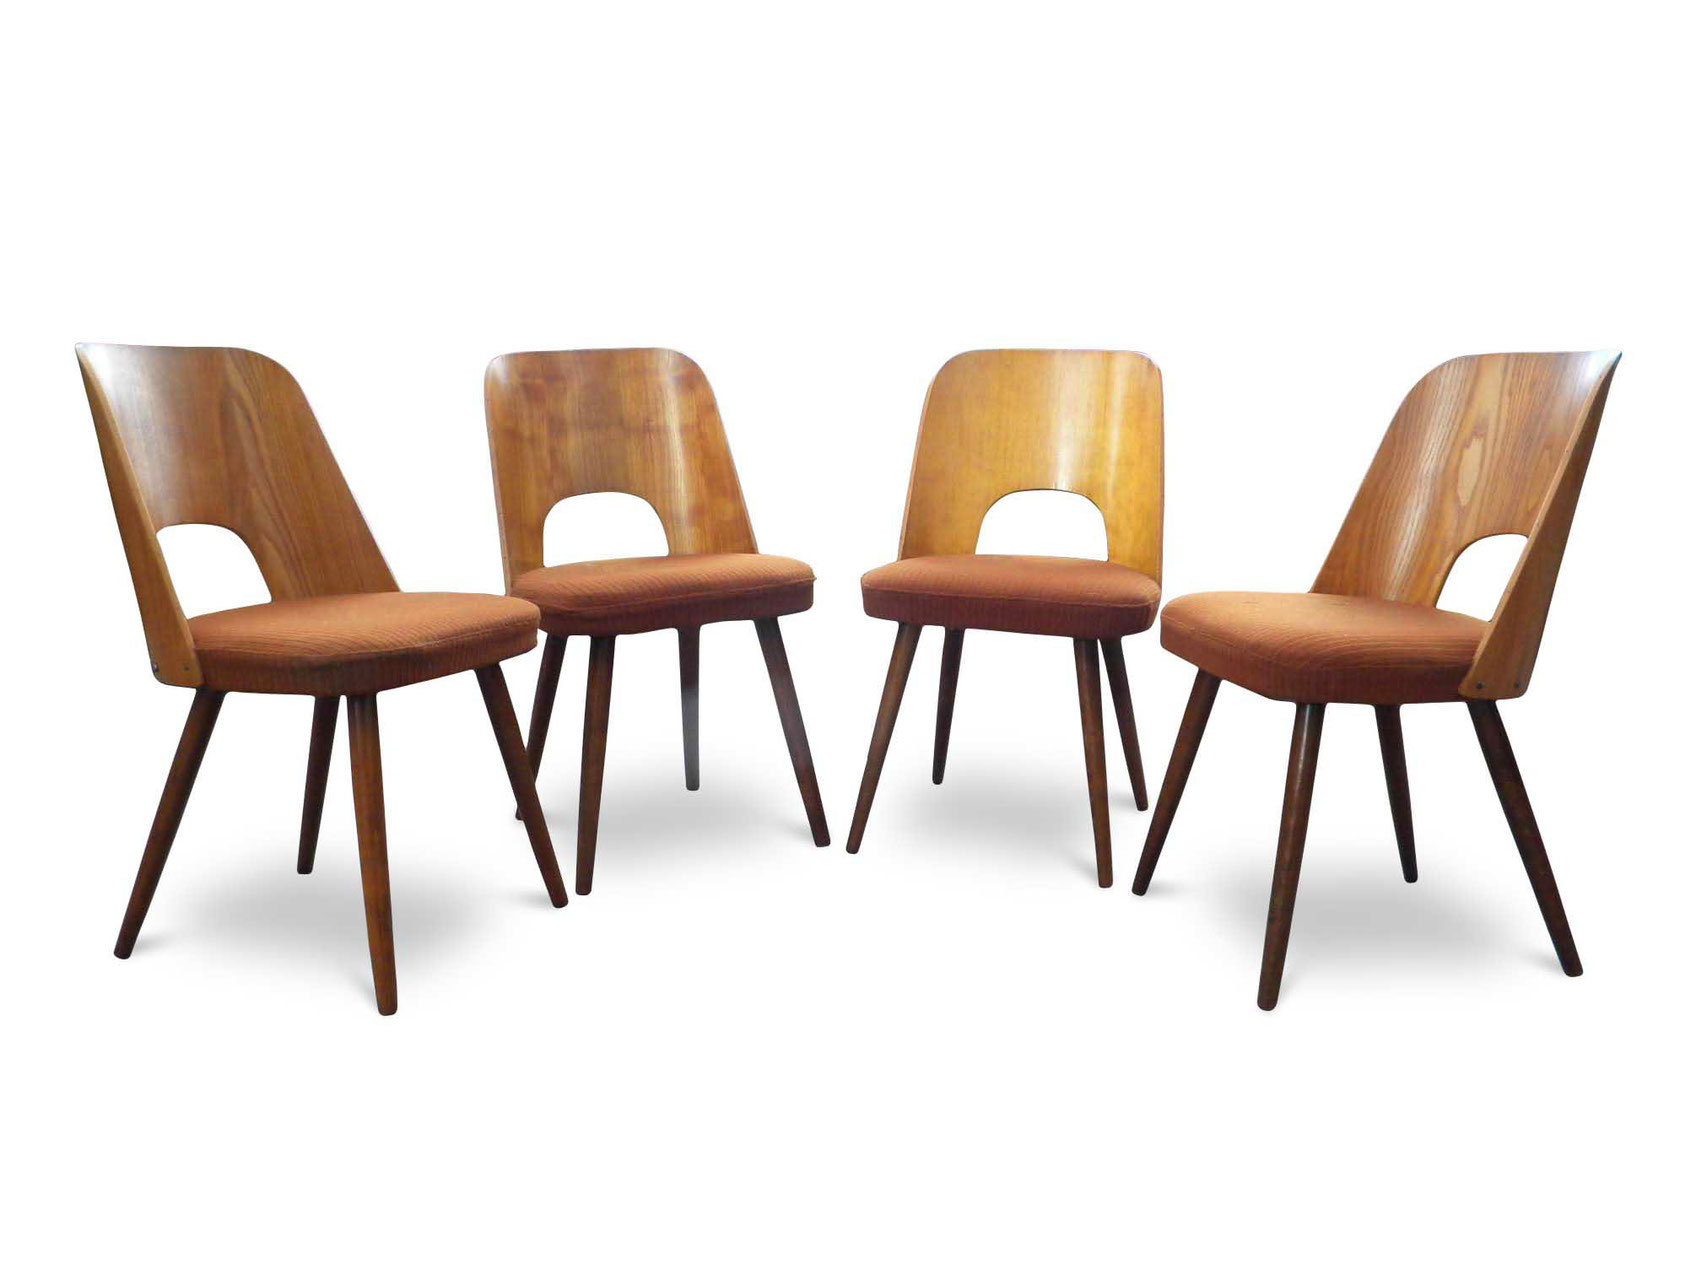 Sedie vintage anni 50 modernariato italian vintage sofa for Sedie design vintage